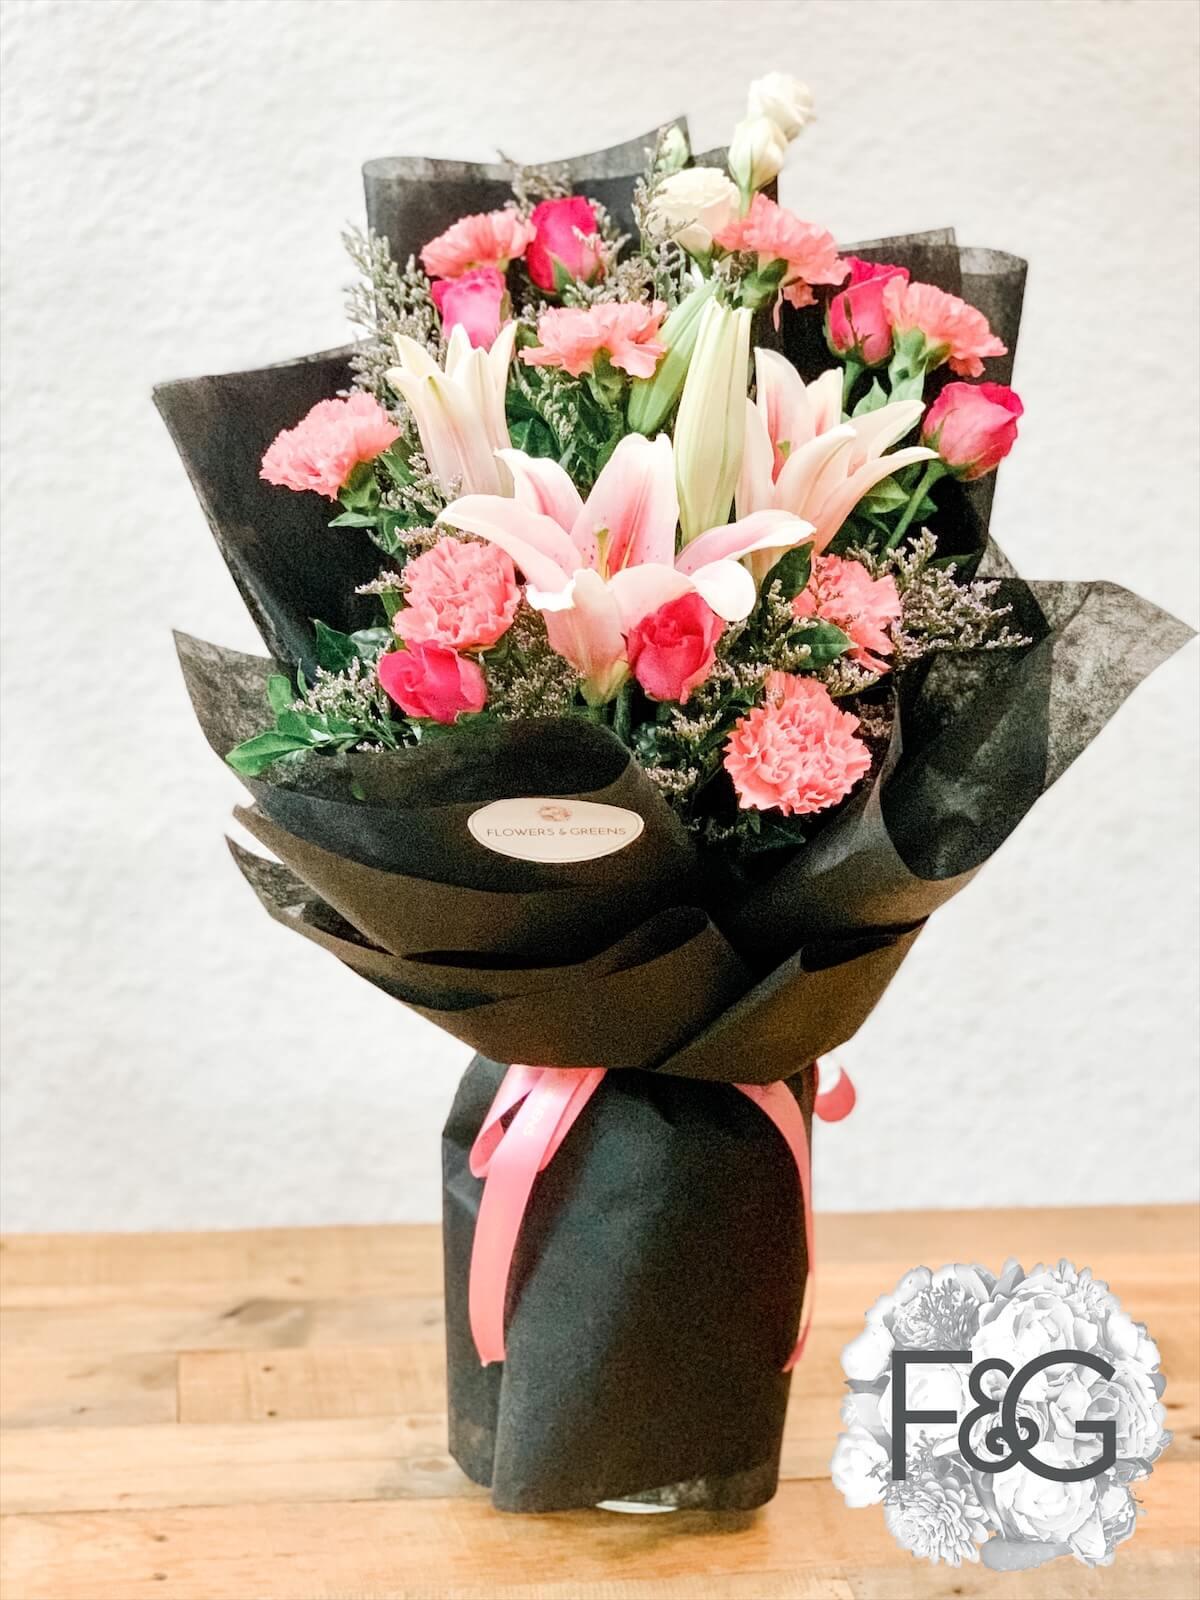 Flowers and Greens Flower Shop | Spring Blossom